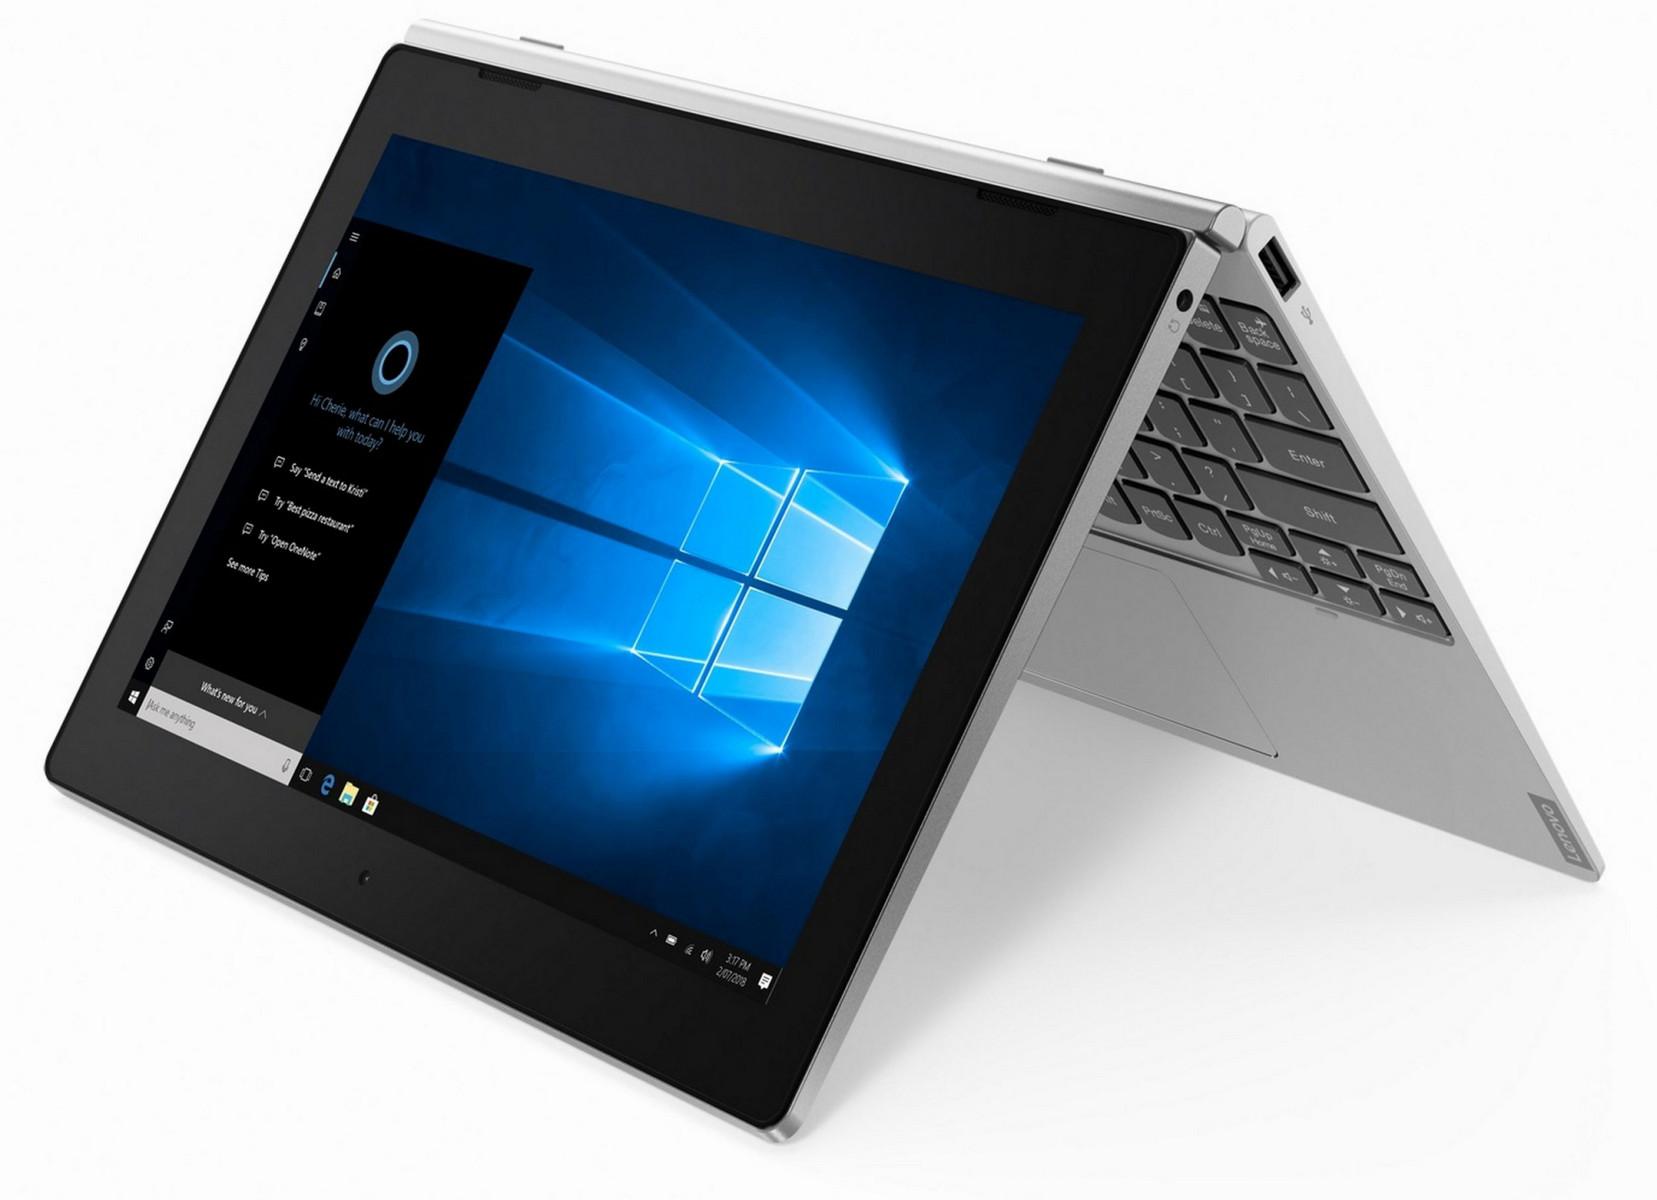 Notebookcheck's Top 10 Laptops under 500 Euros